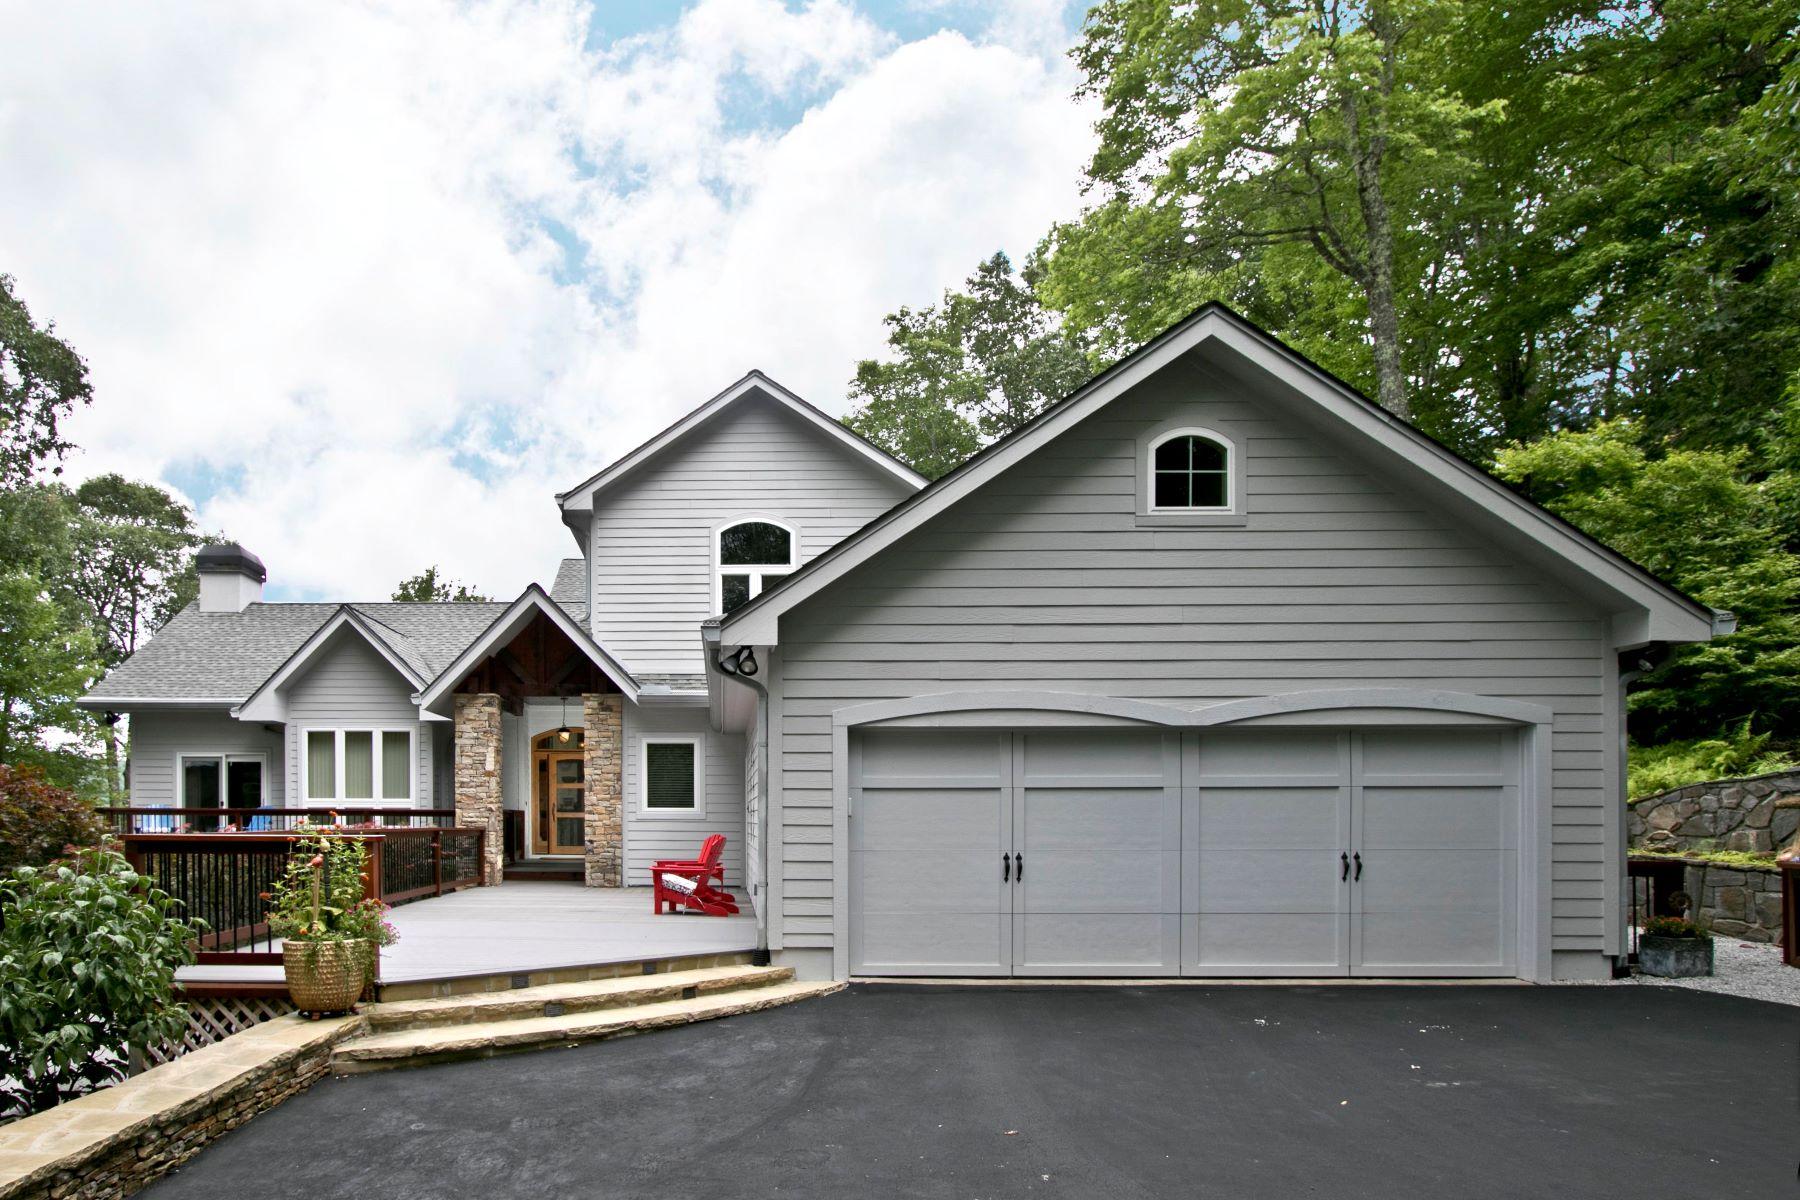 獨棟家庭住宅 為 出售 在 Highlands Falls Country Club 150 West Knoll Drive, Highlands, 北卡羅來納州, 28741 美國